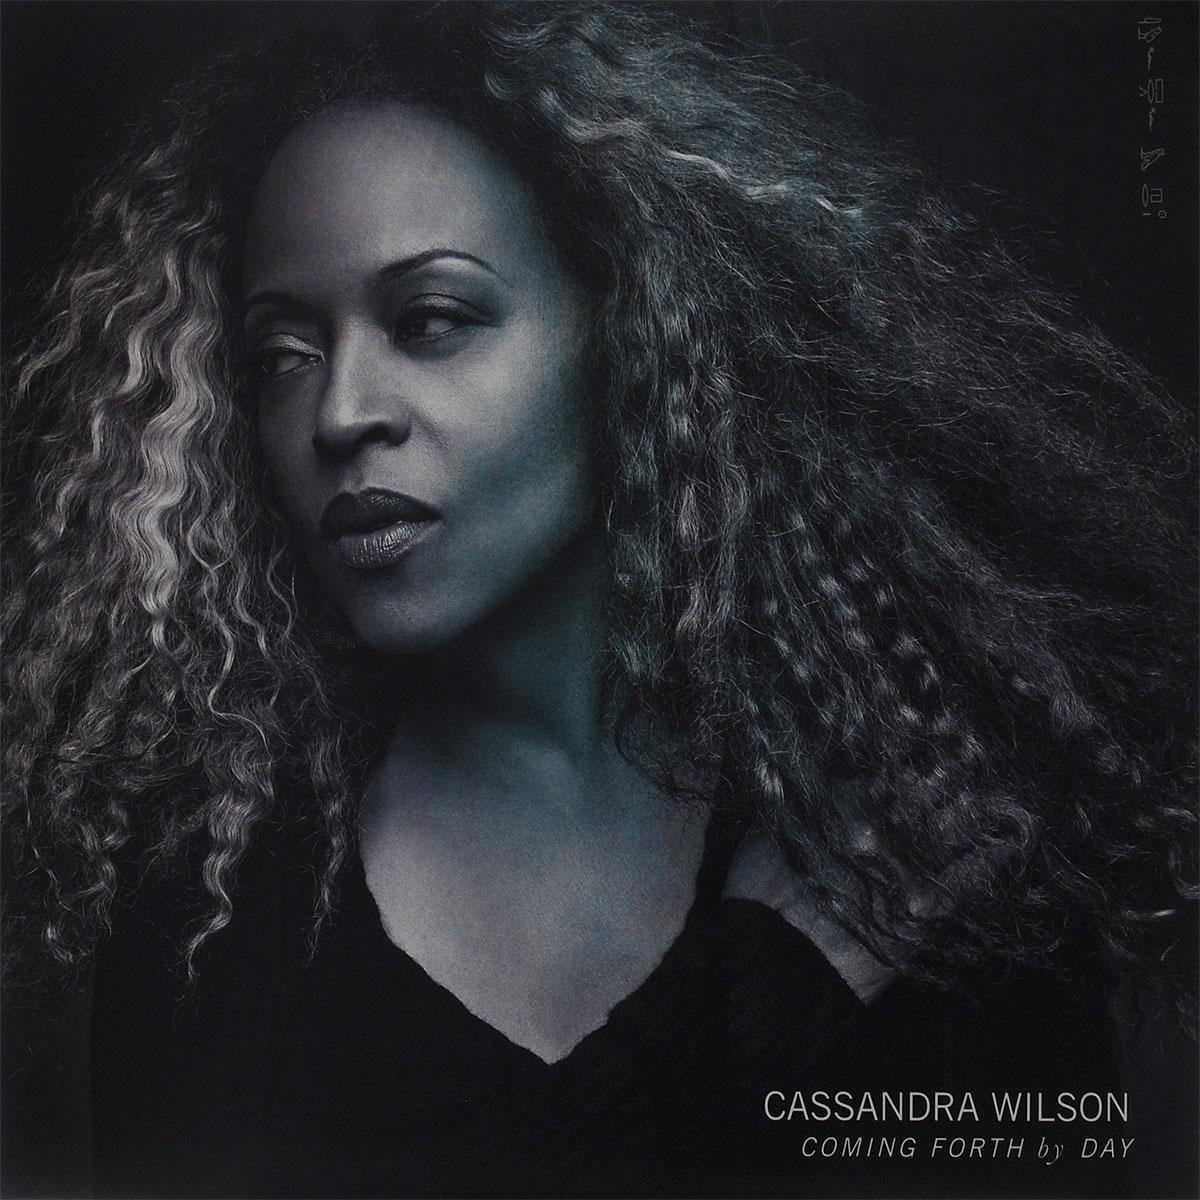 Кассандра Уилсон Cassandra Wilson. Coming Forth By Day (2 LP) виниловая пластинка cassandra wilson coming forth by day